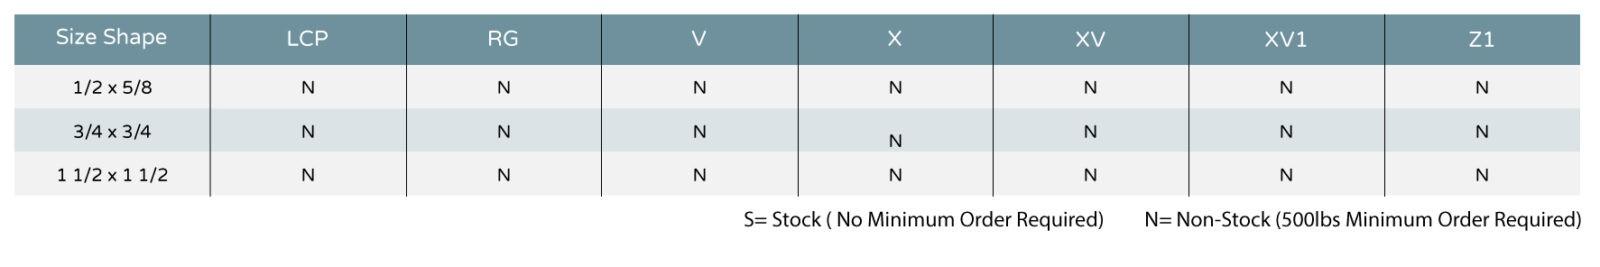 Plastic Media Charts Cylindrical Formulations